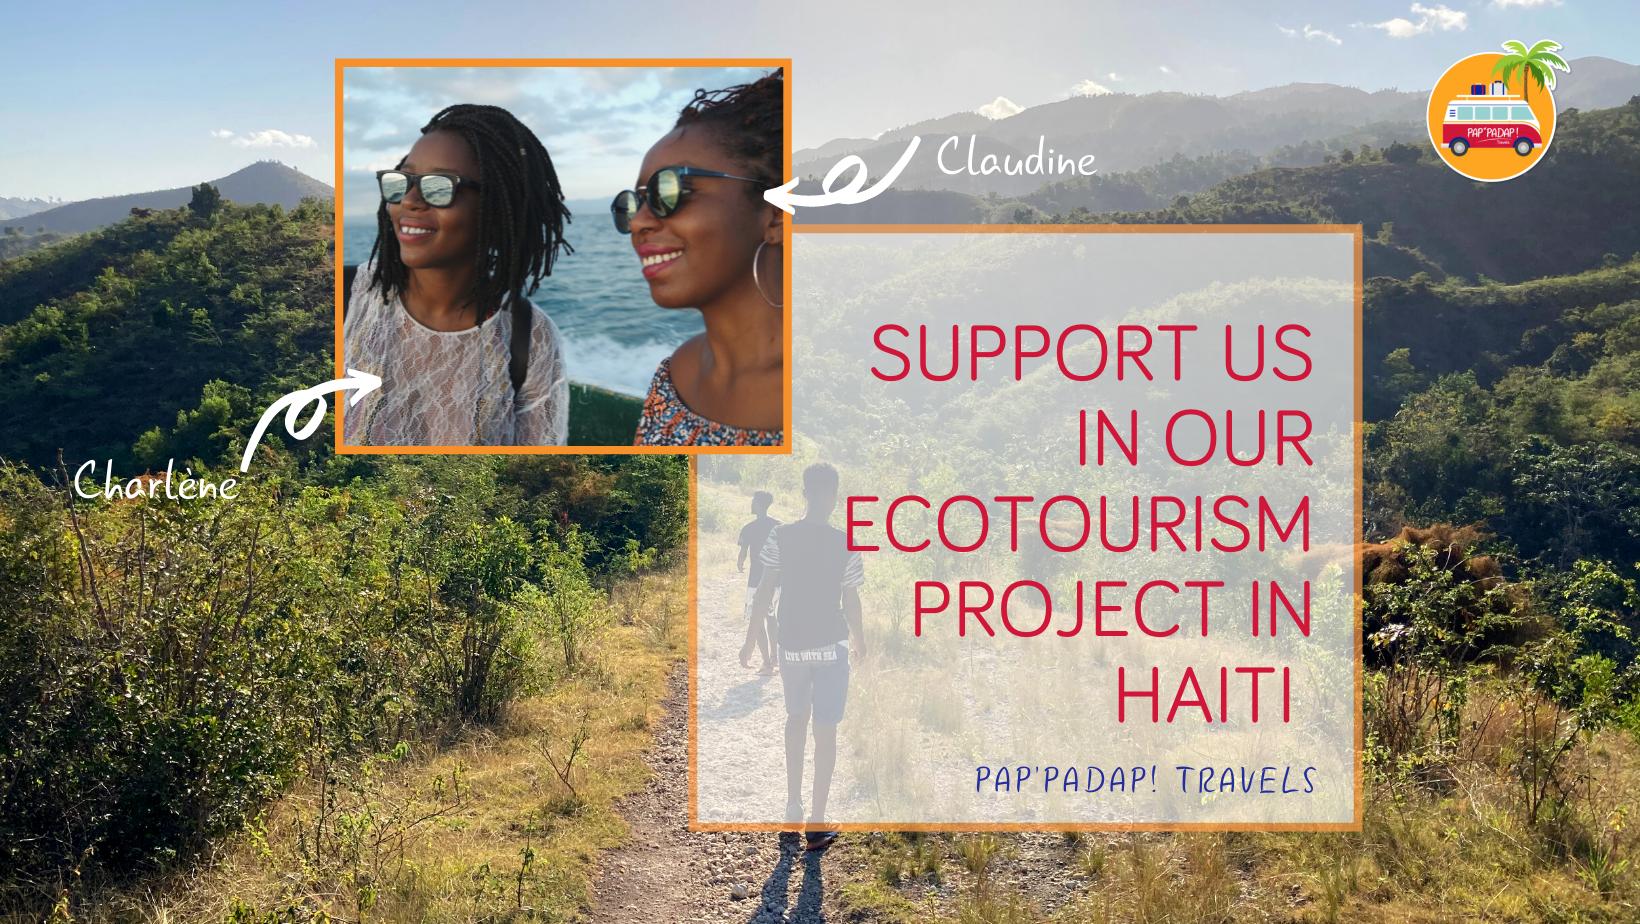 PAP'PADAP! Travels crowdfunding campaign